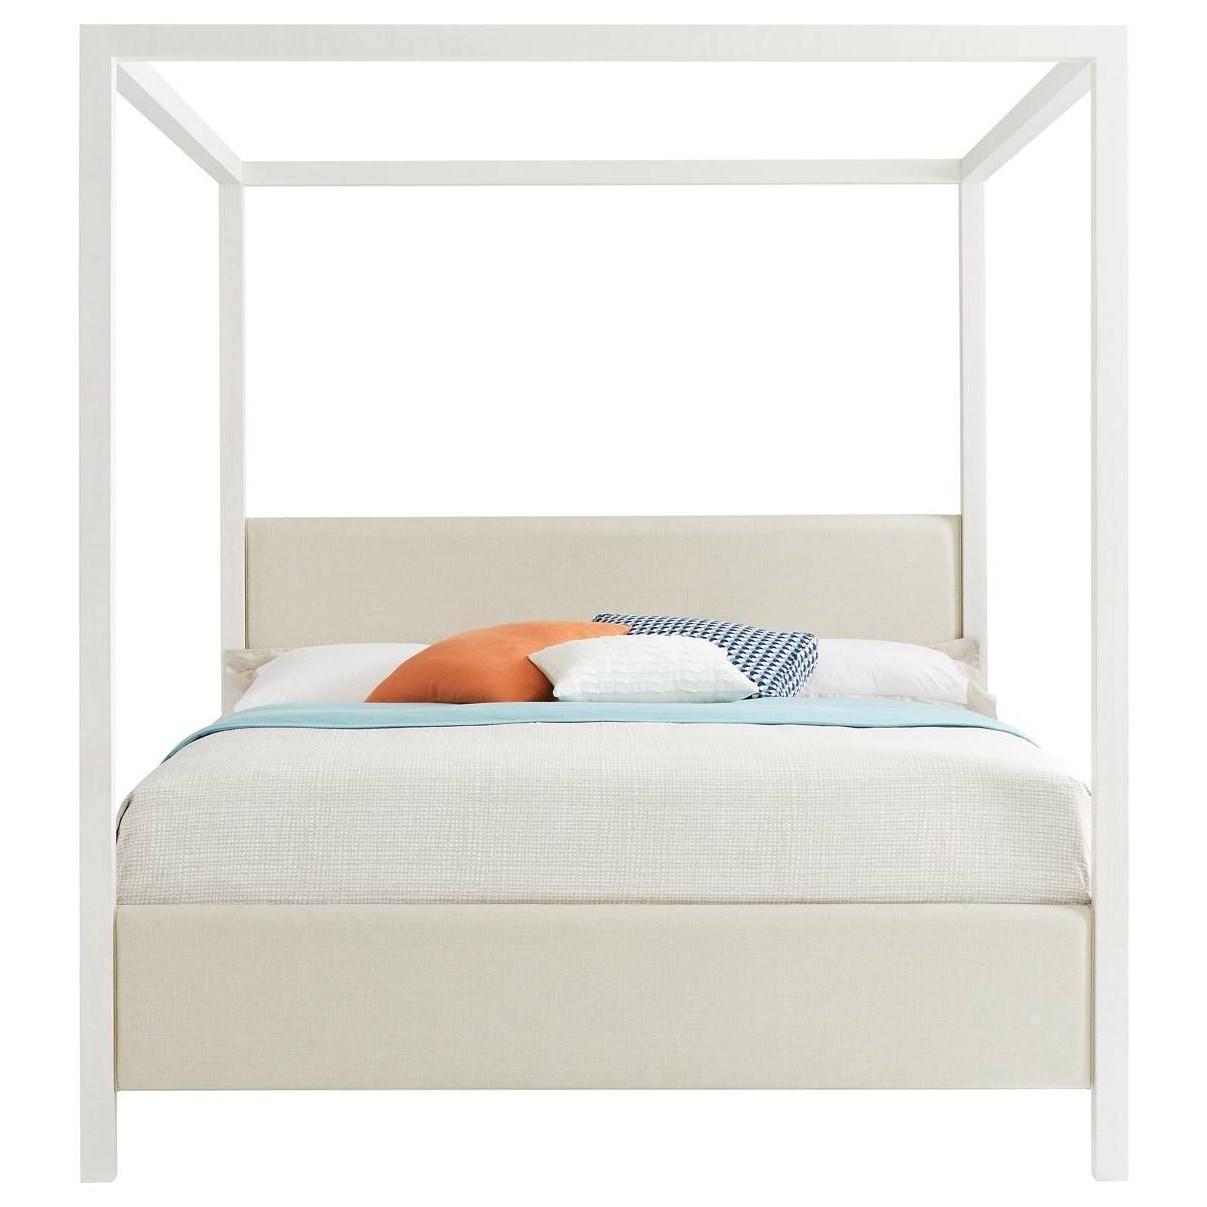 Stanley Furniture Panavista Queen Archetype Canopy Bed - Item Number: 704-23-42